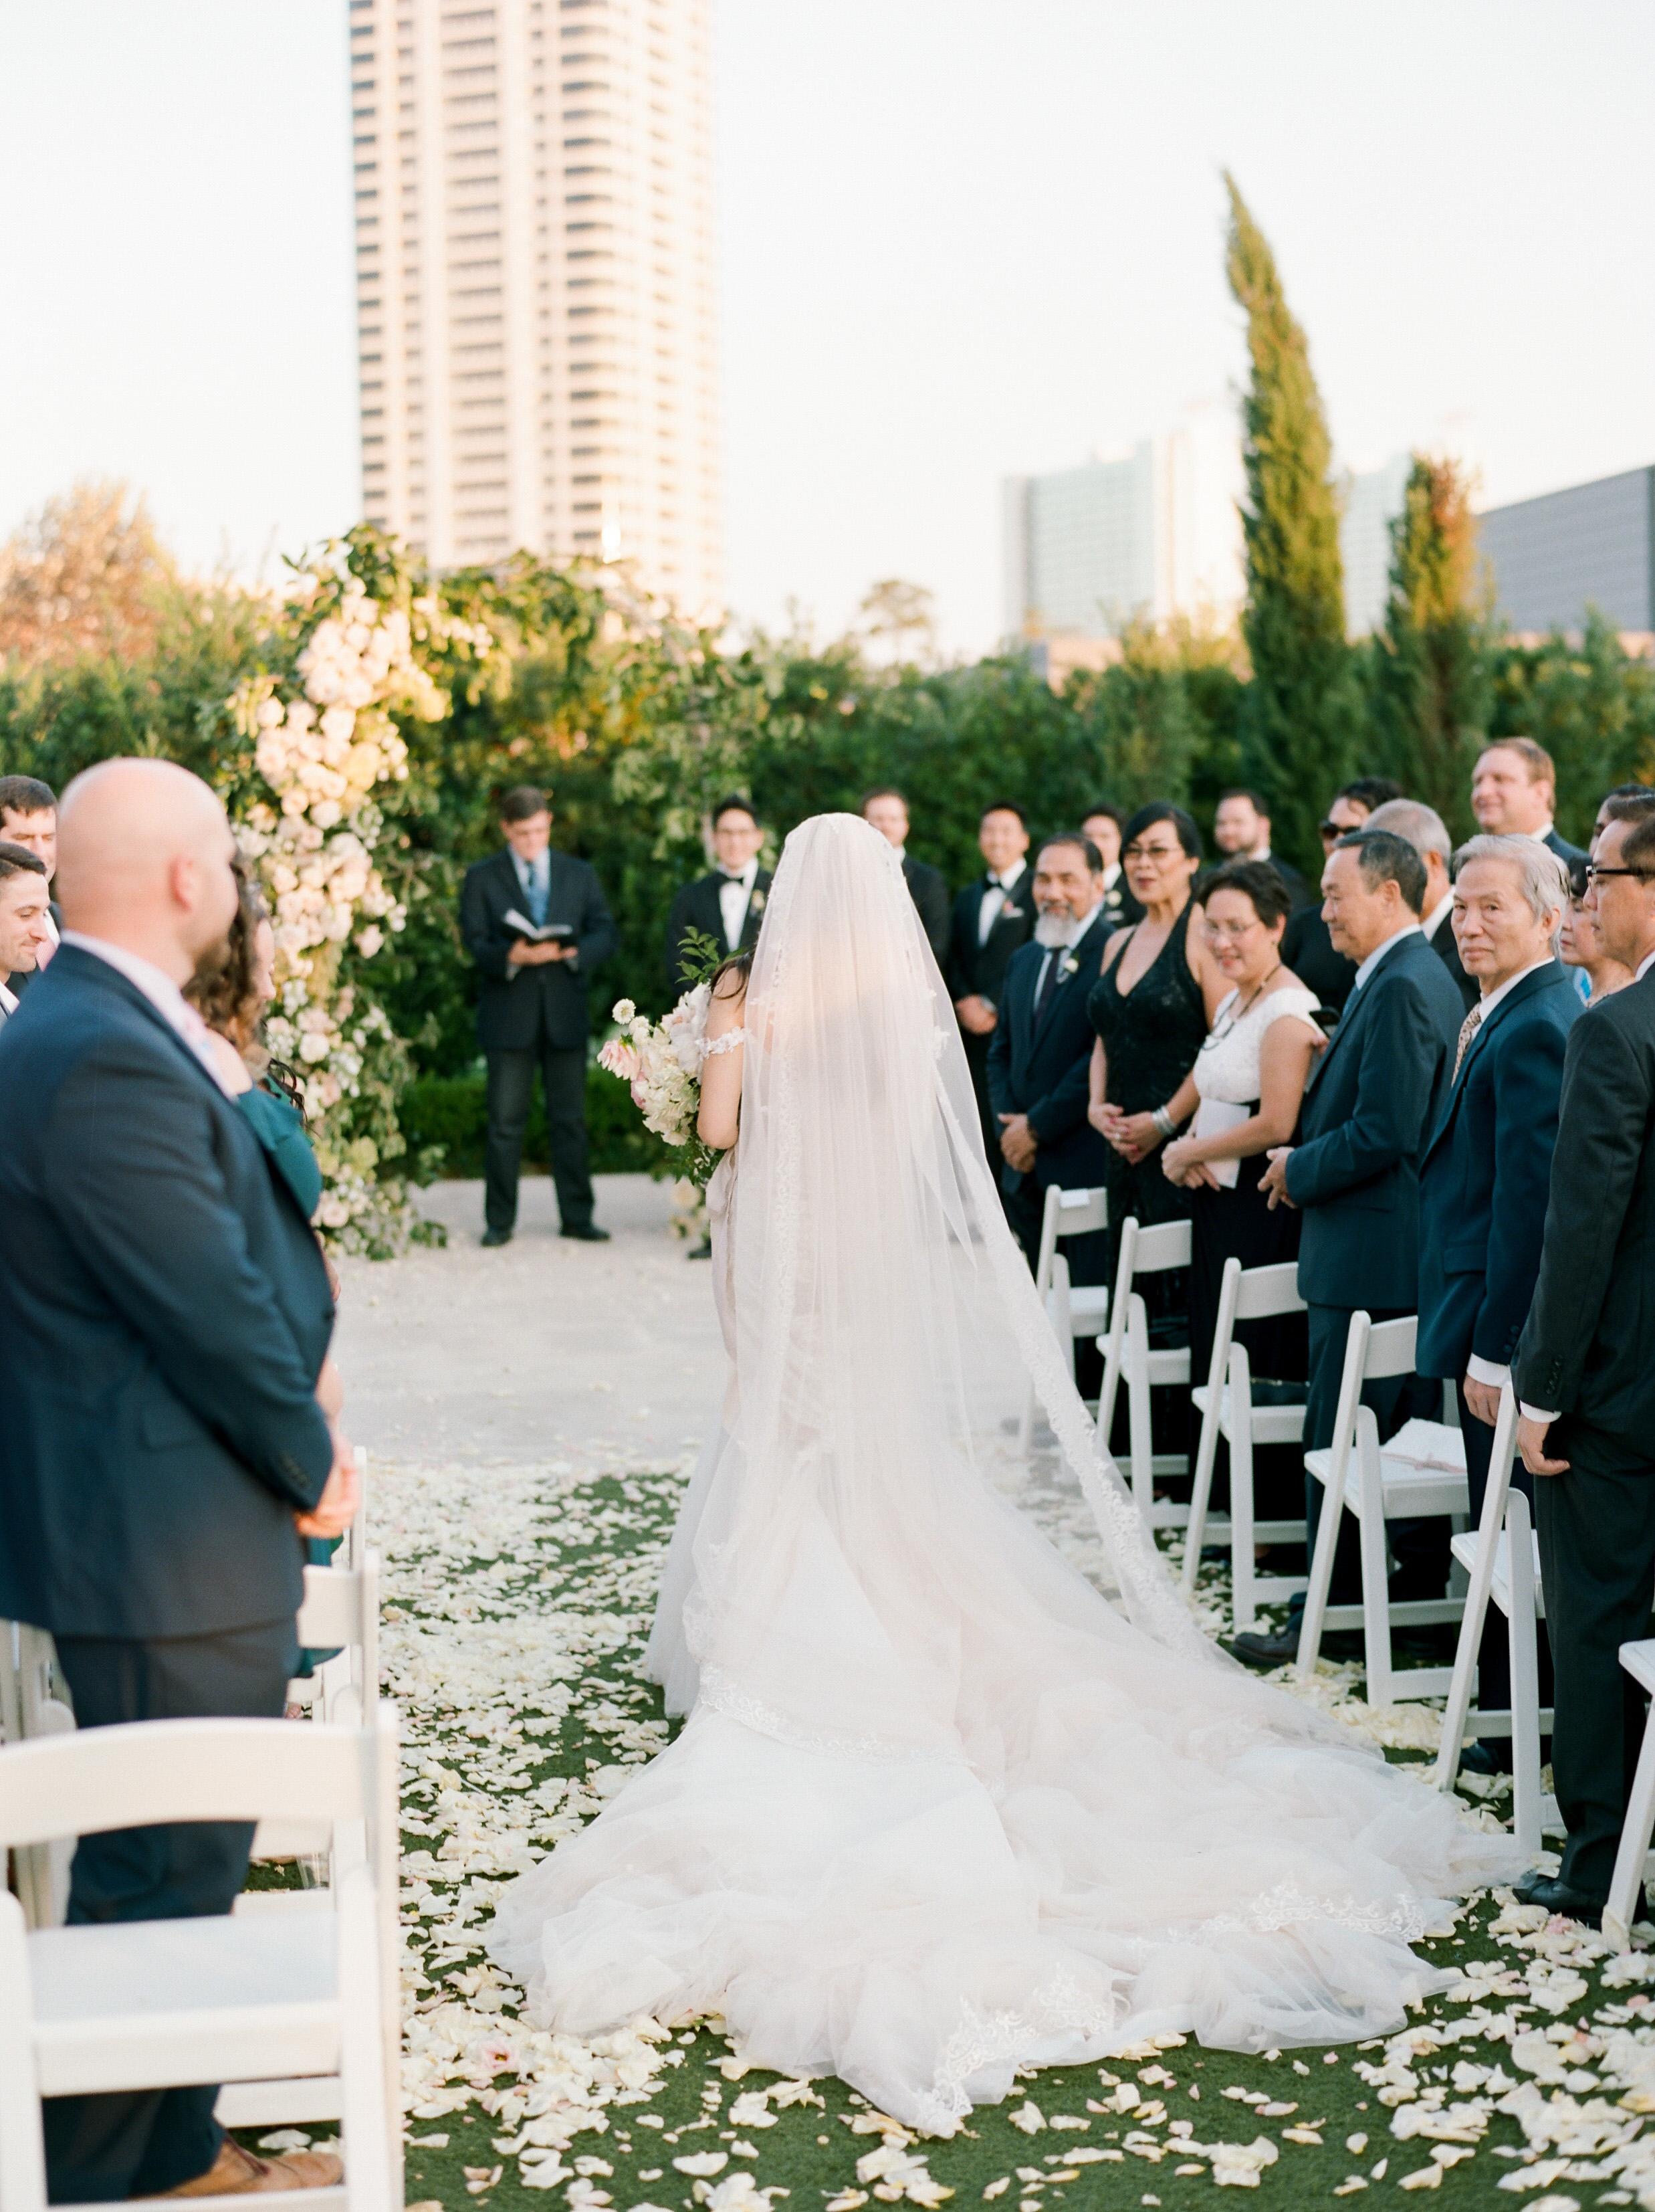 Martha-Stewart-Wedding-Dana-Fernandez-Photography-Josh-Texas-Film-Houston-Wedding-Fine-Art-Photographer-McGovern-Centennial-Gardens-Top-Best-122.jpg